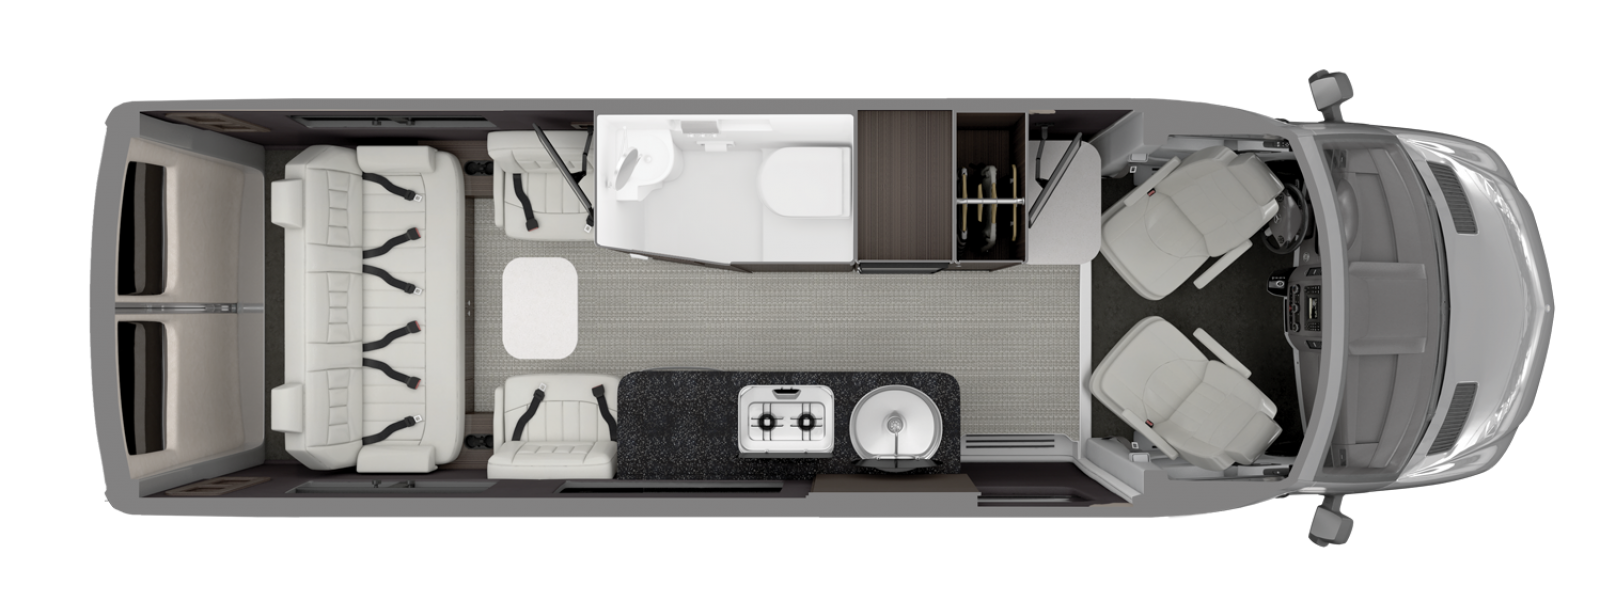 Airstream Interstate Grand Tour EXT